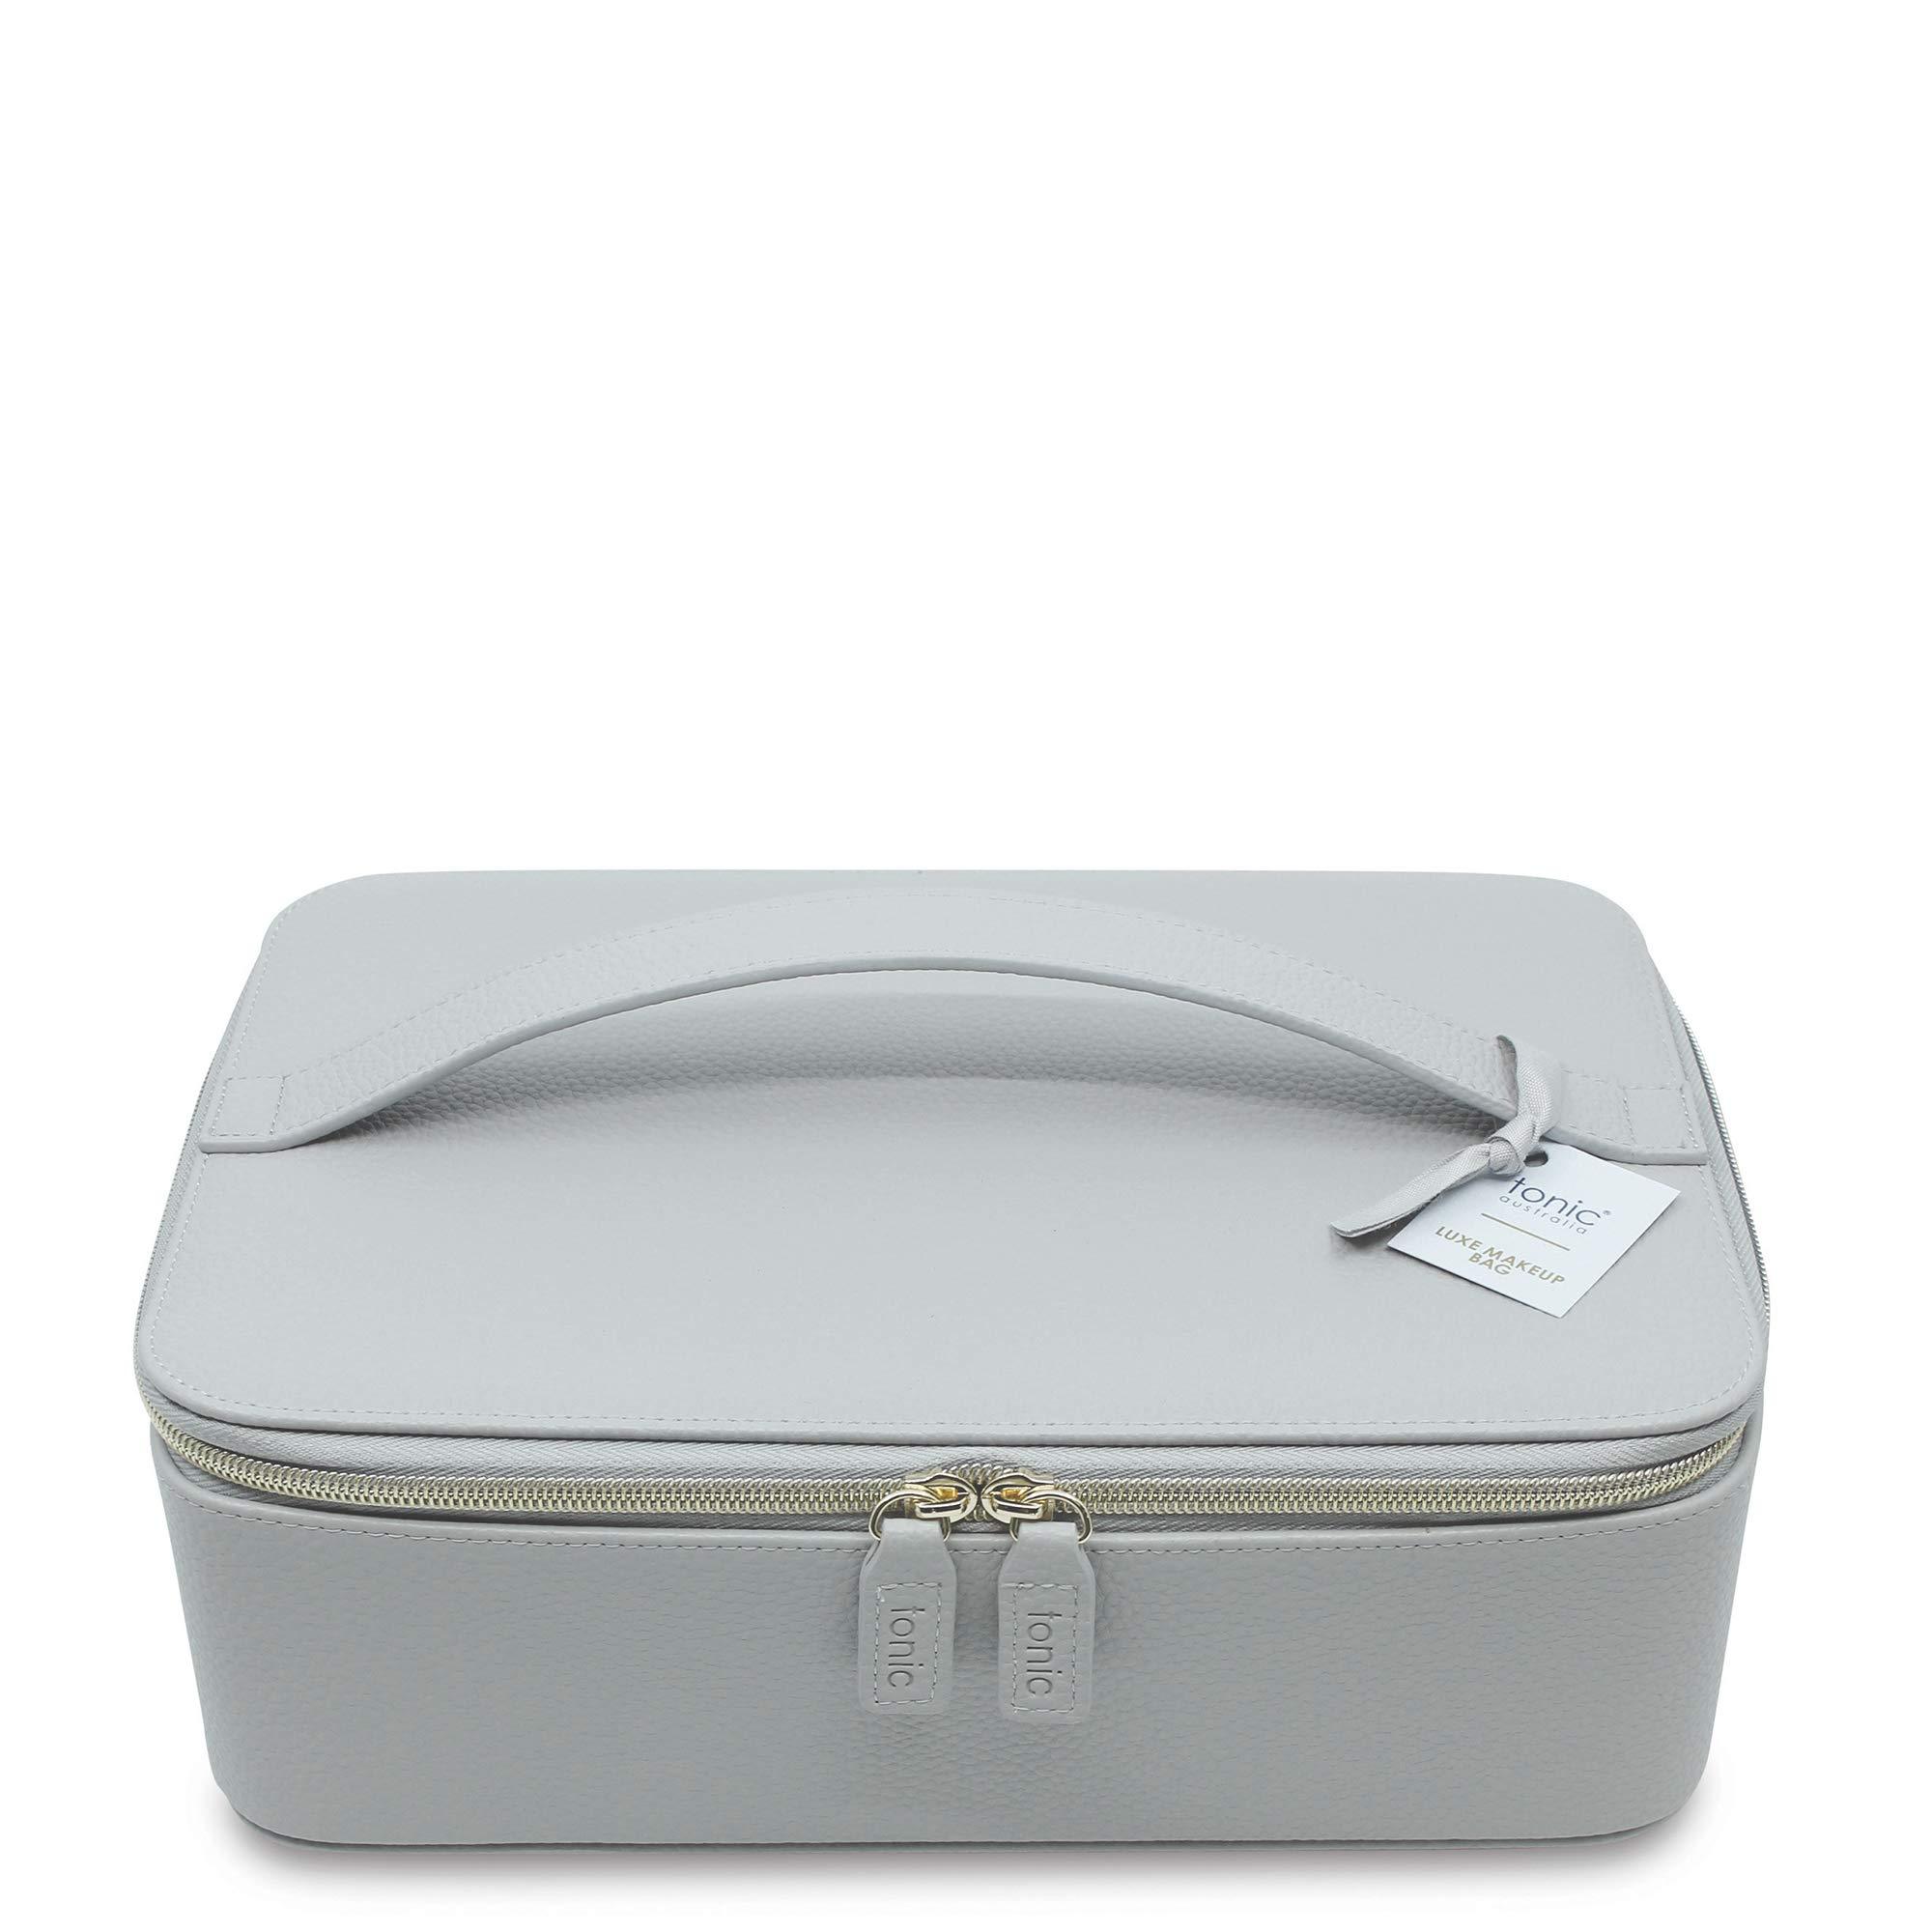 Tonic Australia Luxe Make Up Case - Dove